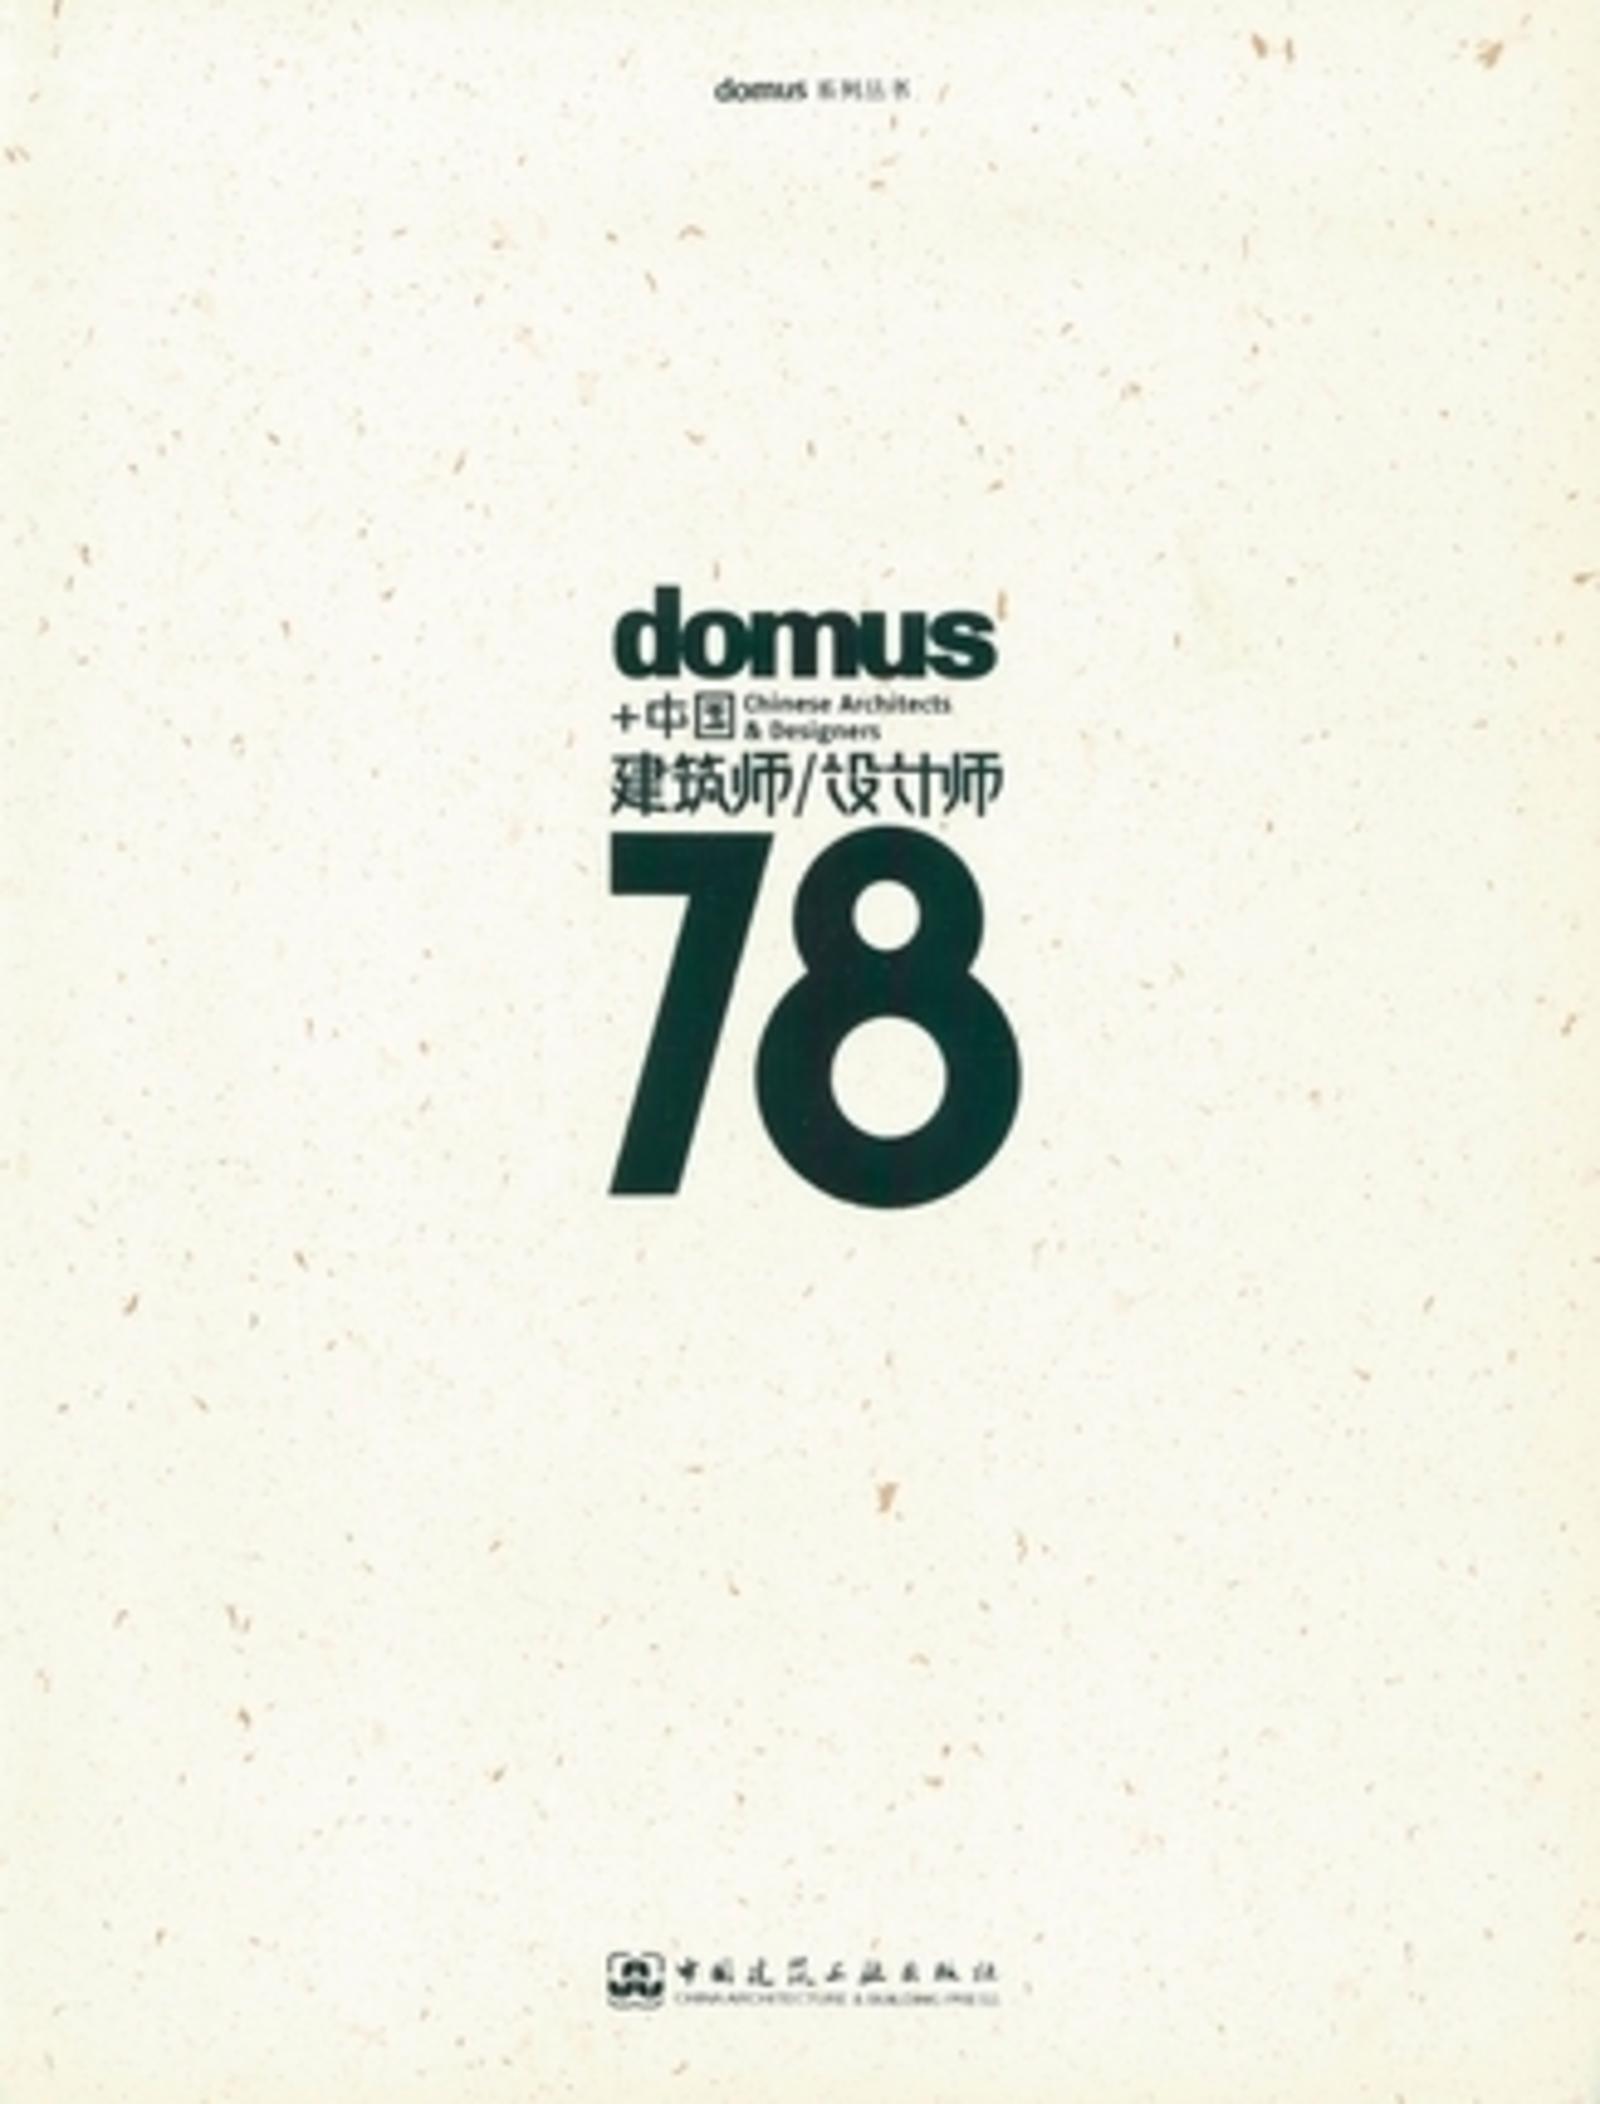 DOMUS 78 + CHINESE ARCHITECTS AND DESIGNERS - ARCHITECTES ETDESIGNERS CHINOIS